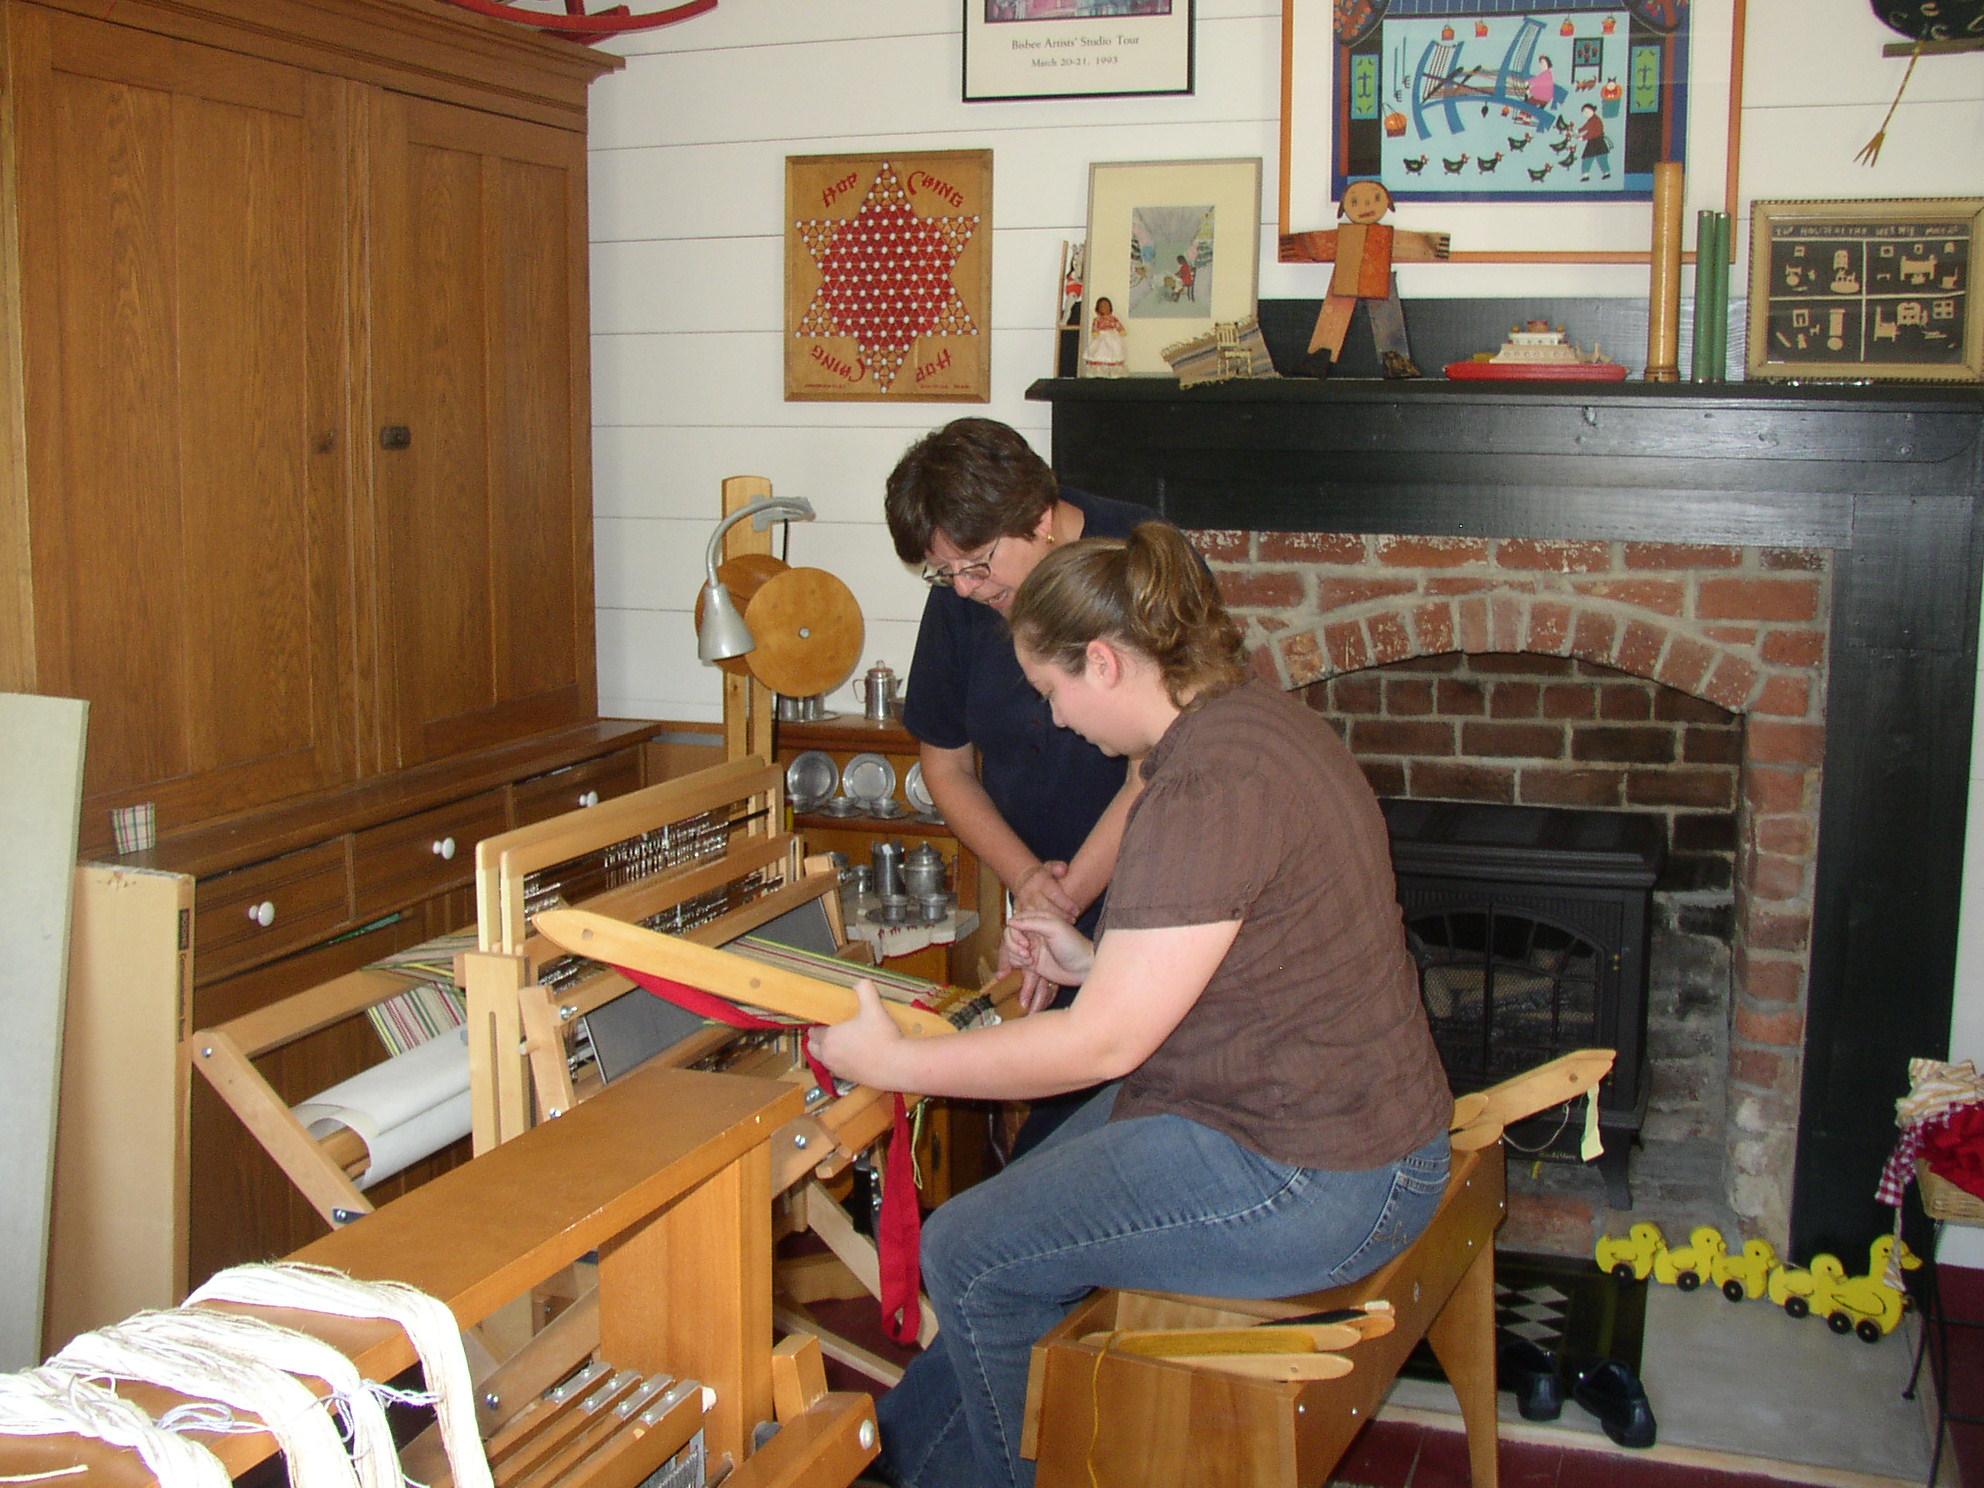 Lynn Pownell teaches me how to work the loom